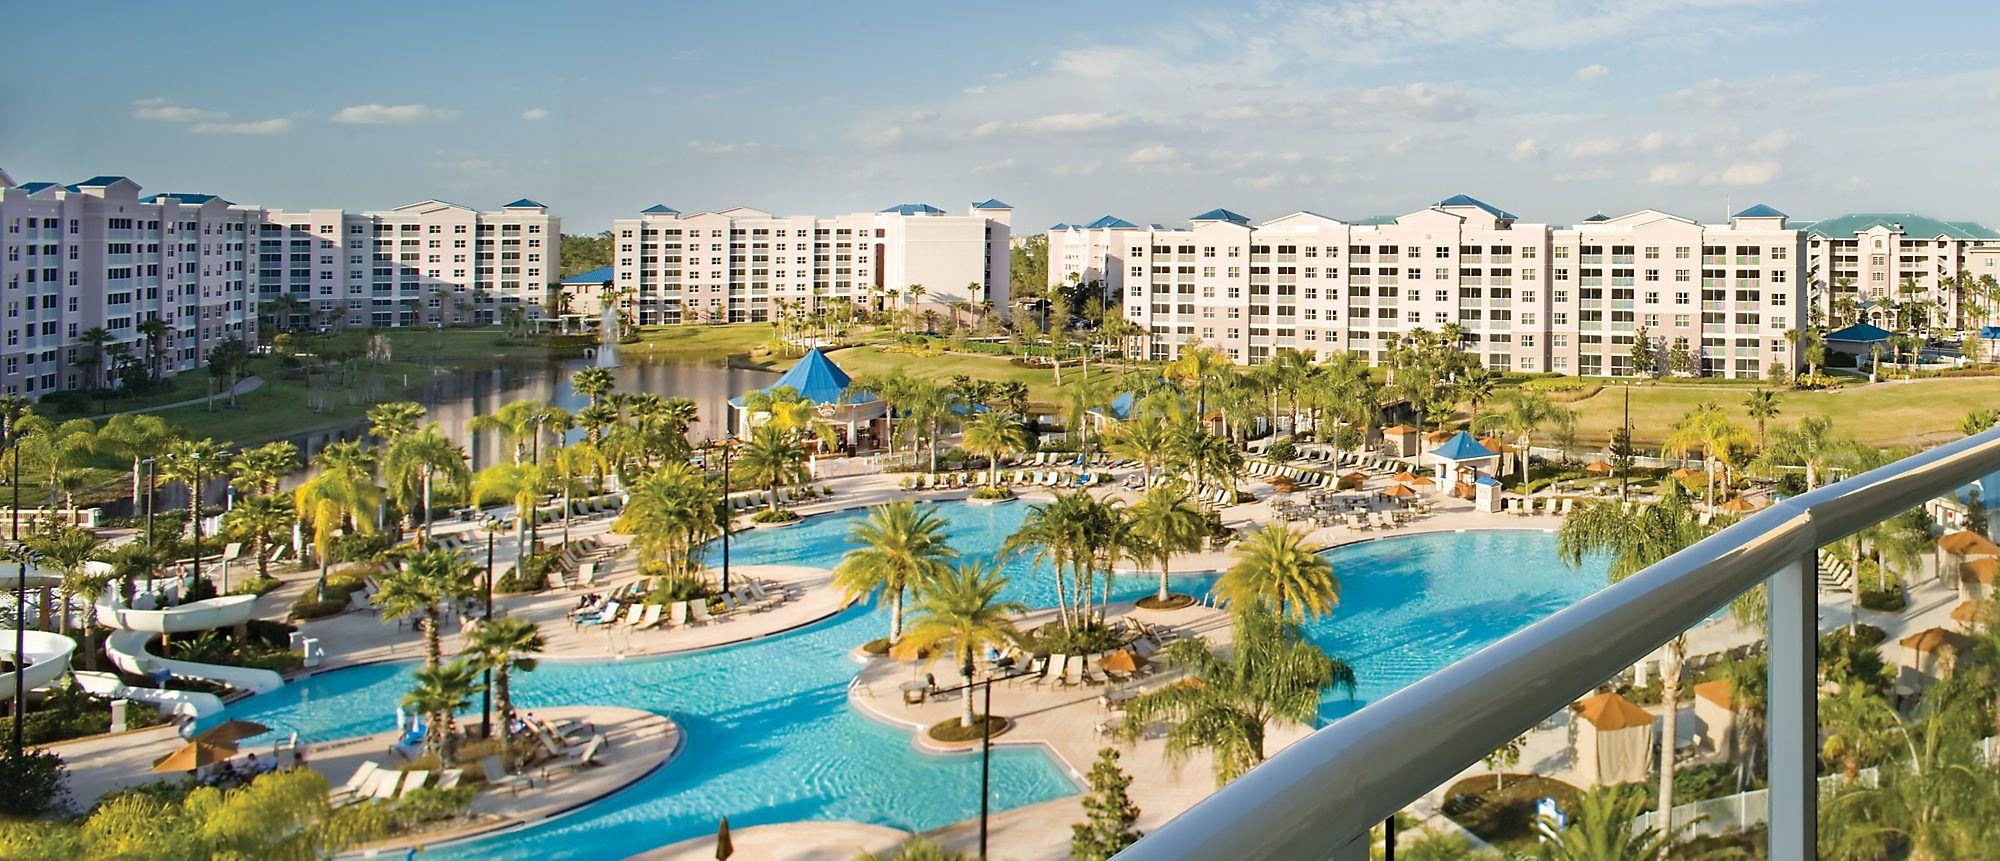 The Fountains Resort Fountain resort